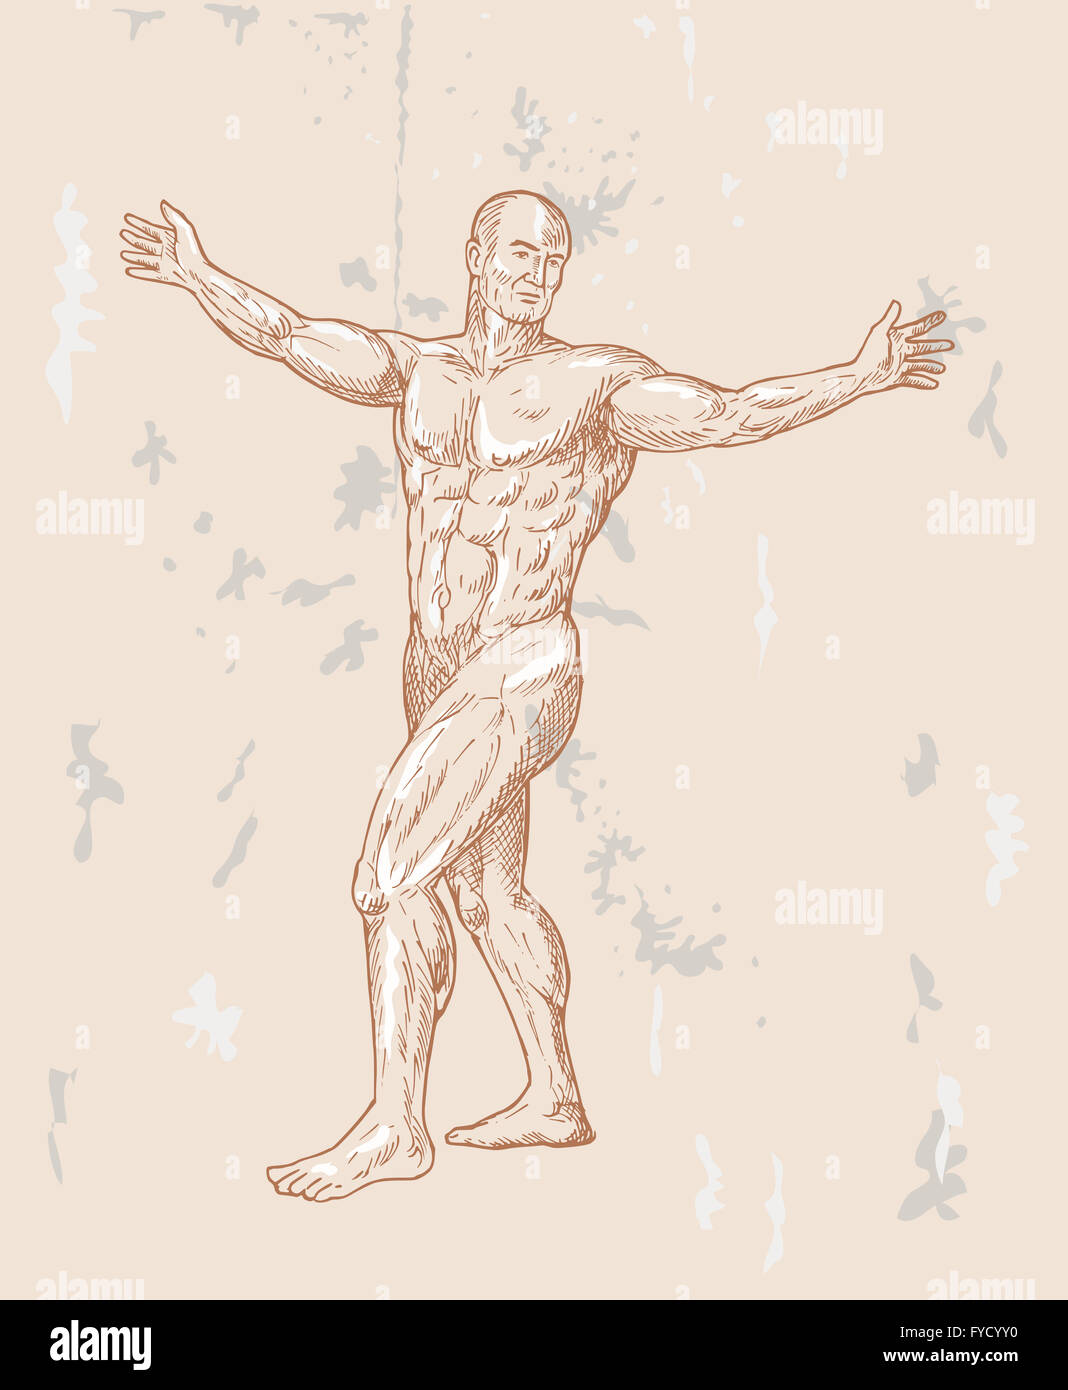 Human Body Anatomy Full Figure Stockfotos & Human Body Anatomy Full ...